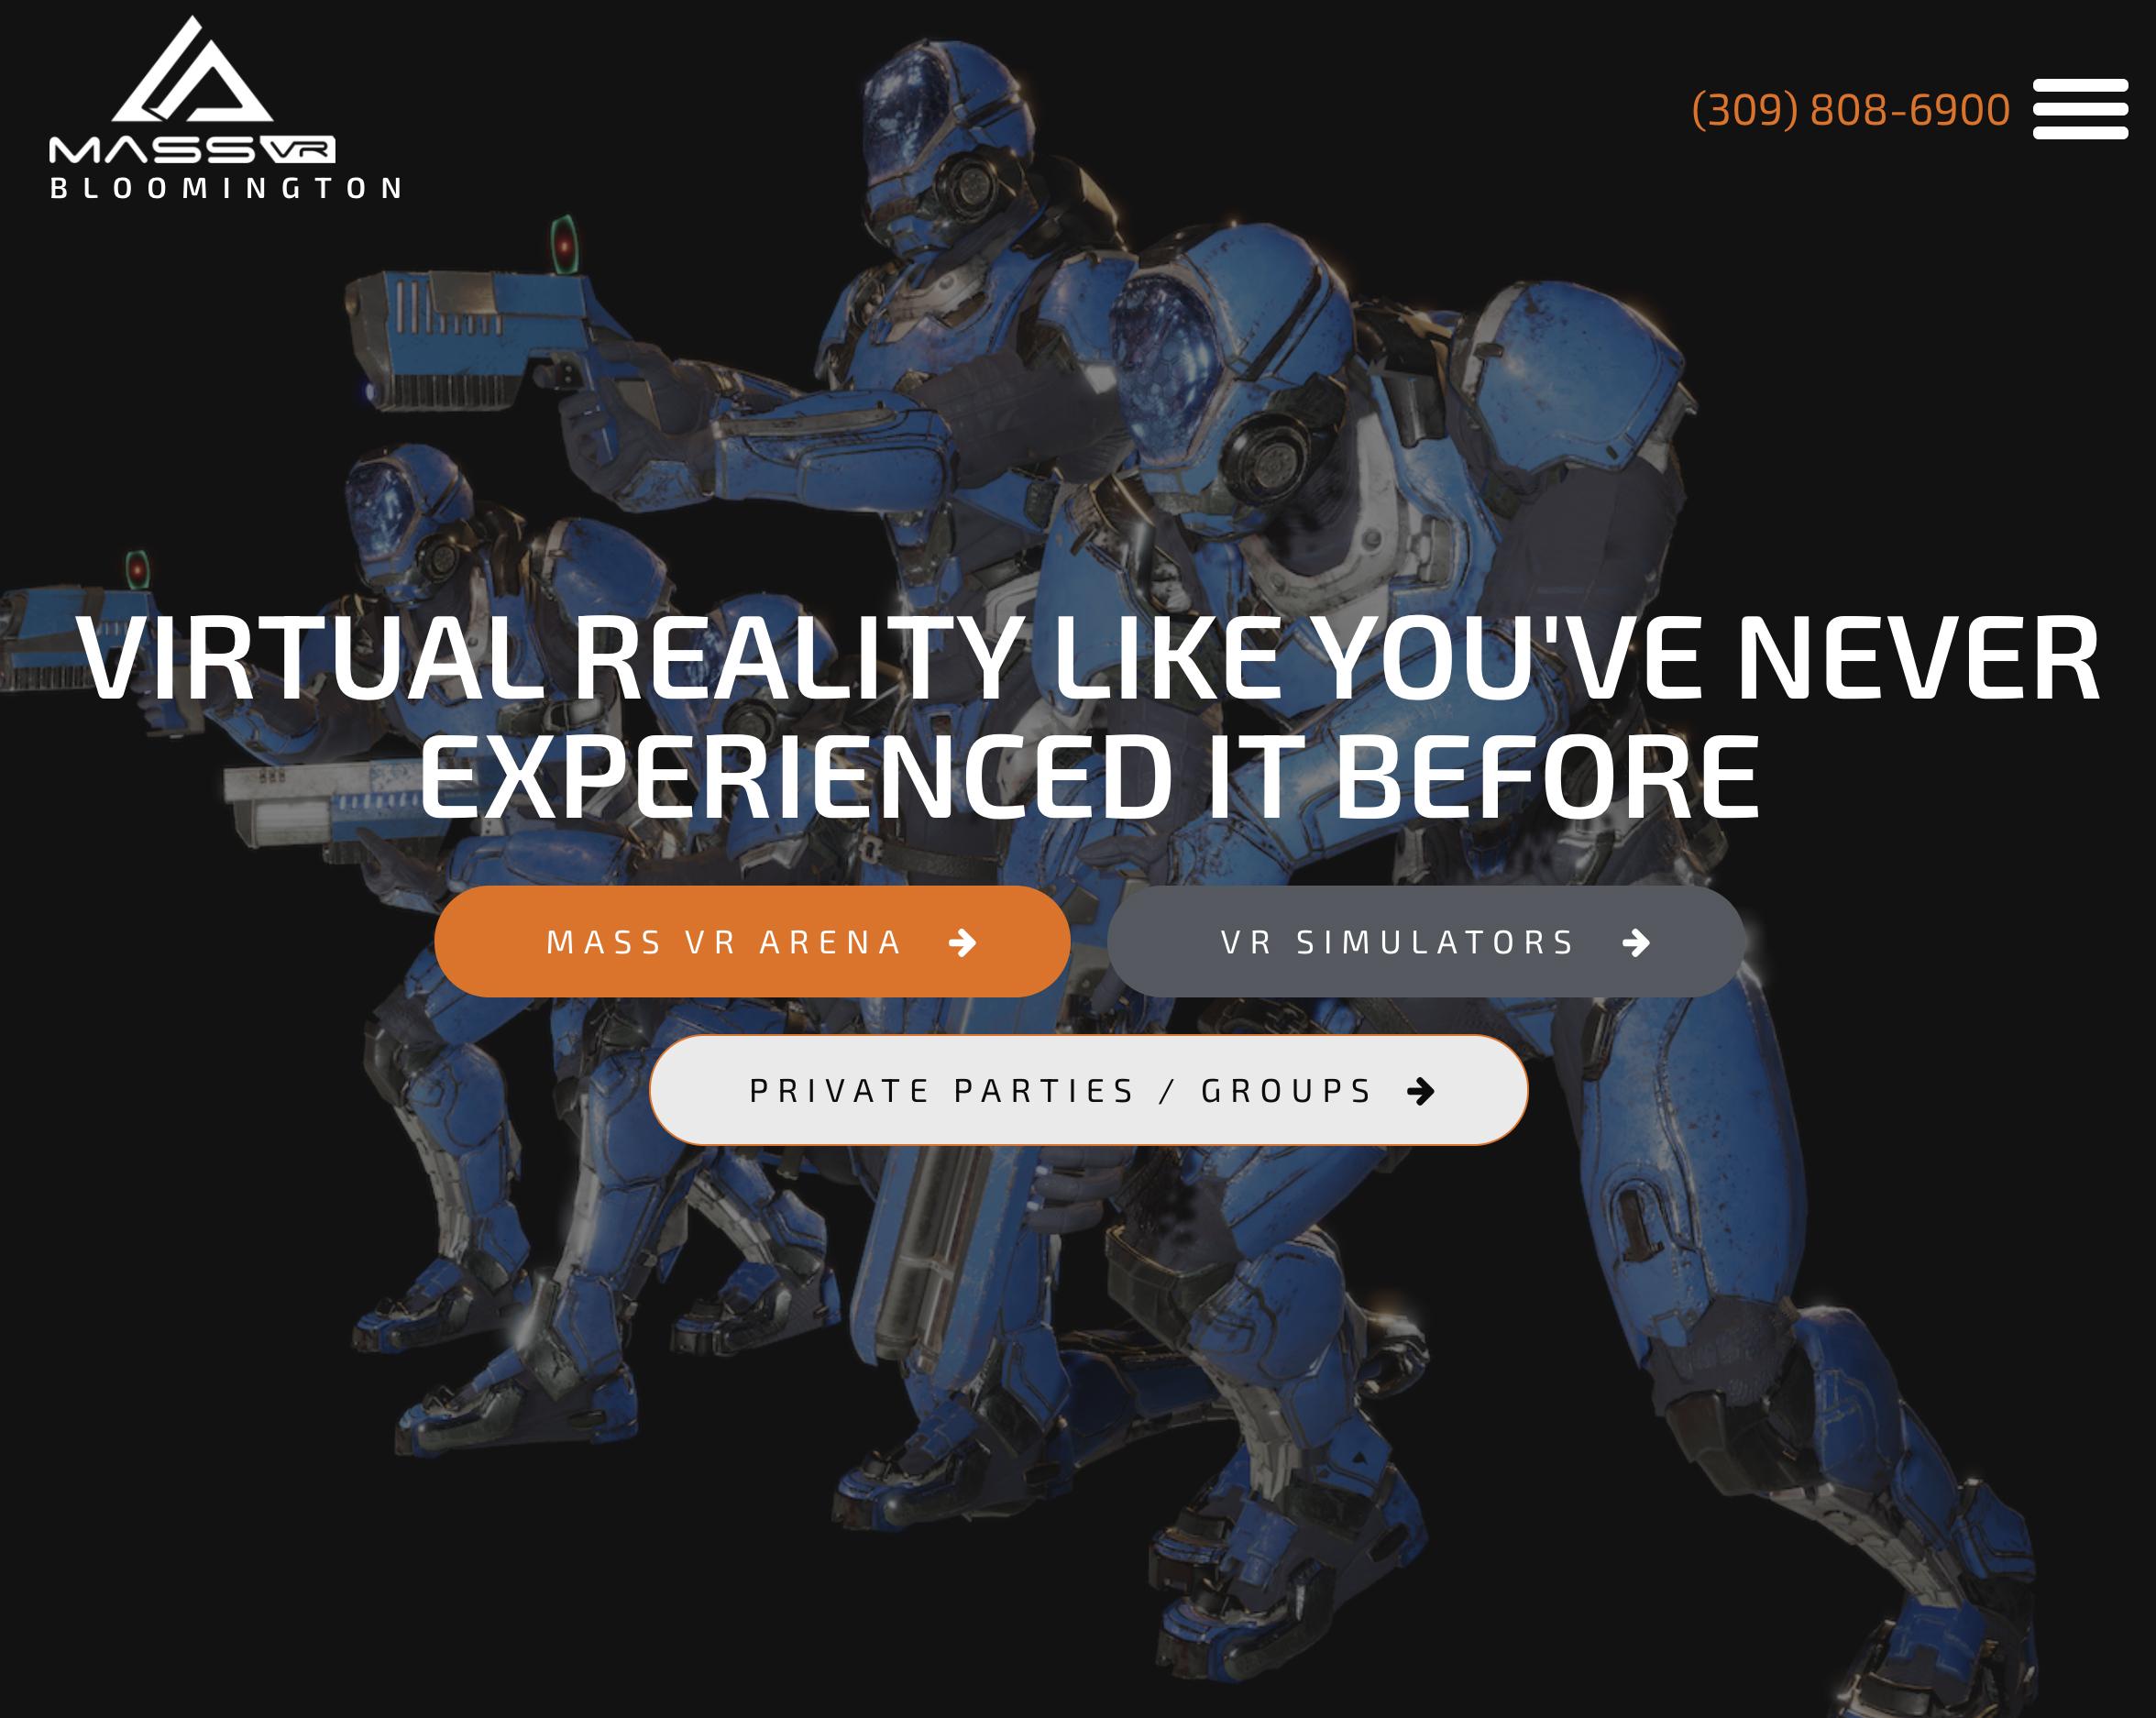 MASS VR BLOOMINGTON